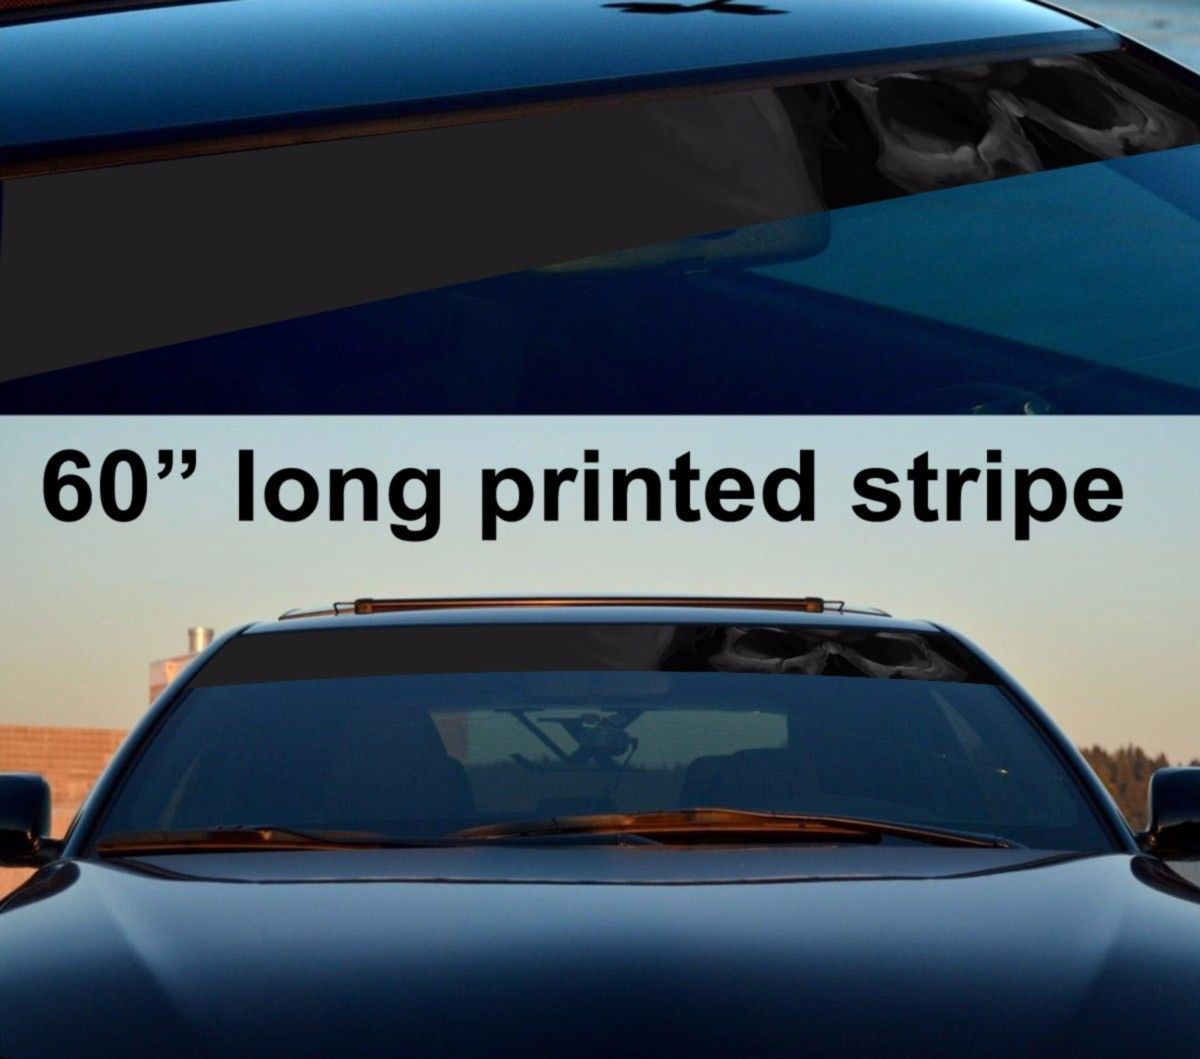 Car sticker design ebay - 60 Skull Shadow Dark Death Sun Strip Printed Windshield Car Vinyl Sticker Decal Ebay